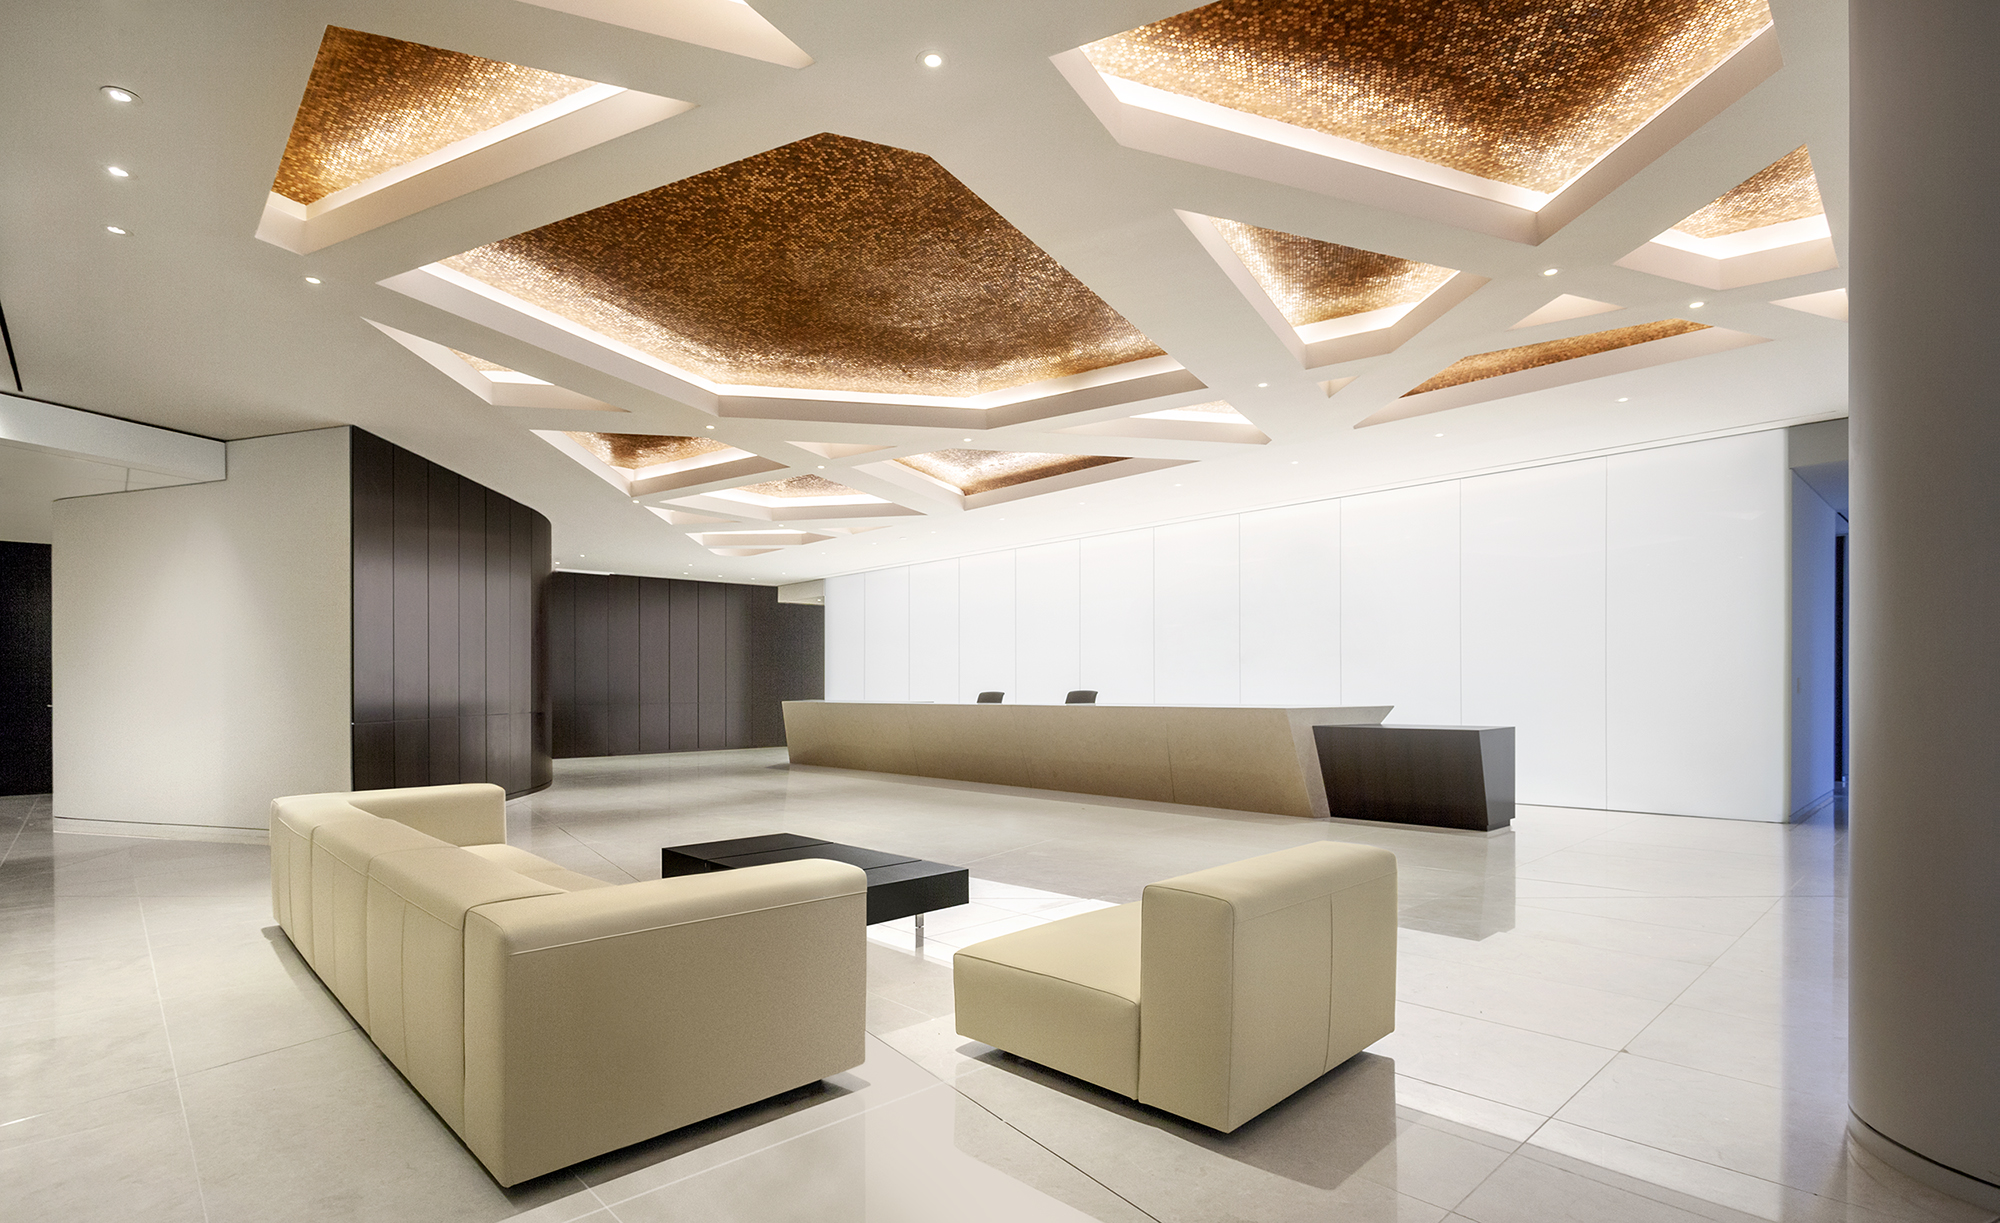 certusbank_headquarters_greenville_south_carolina_waiting_area.jpg